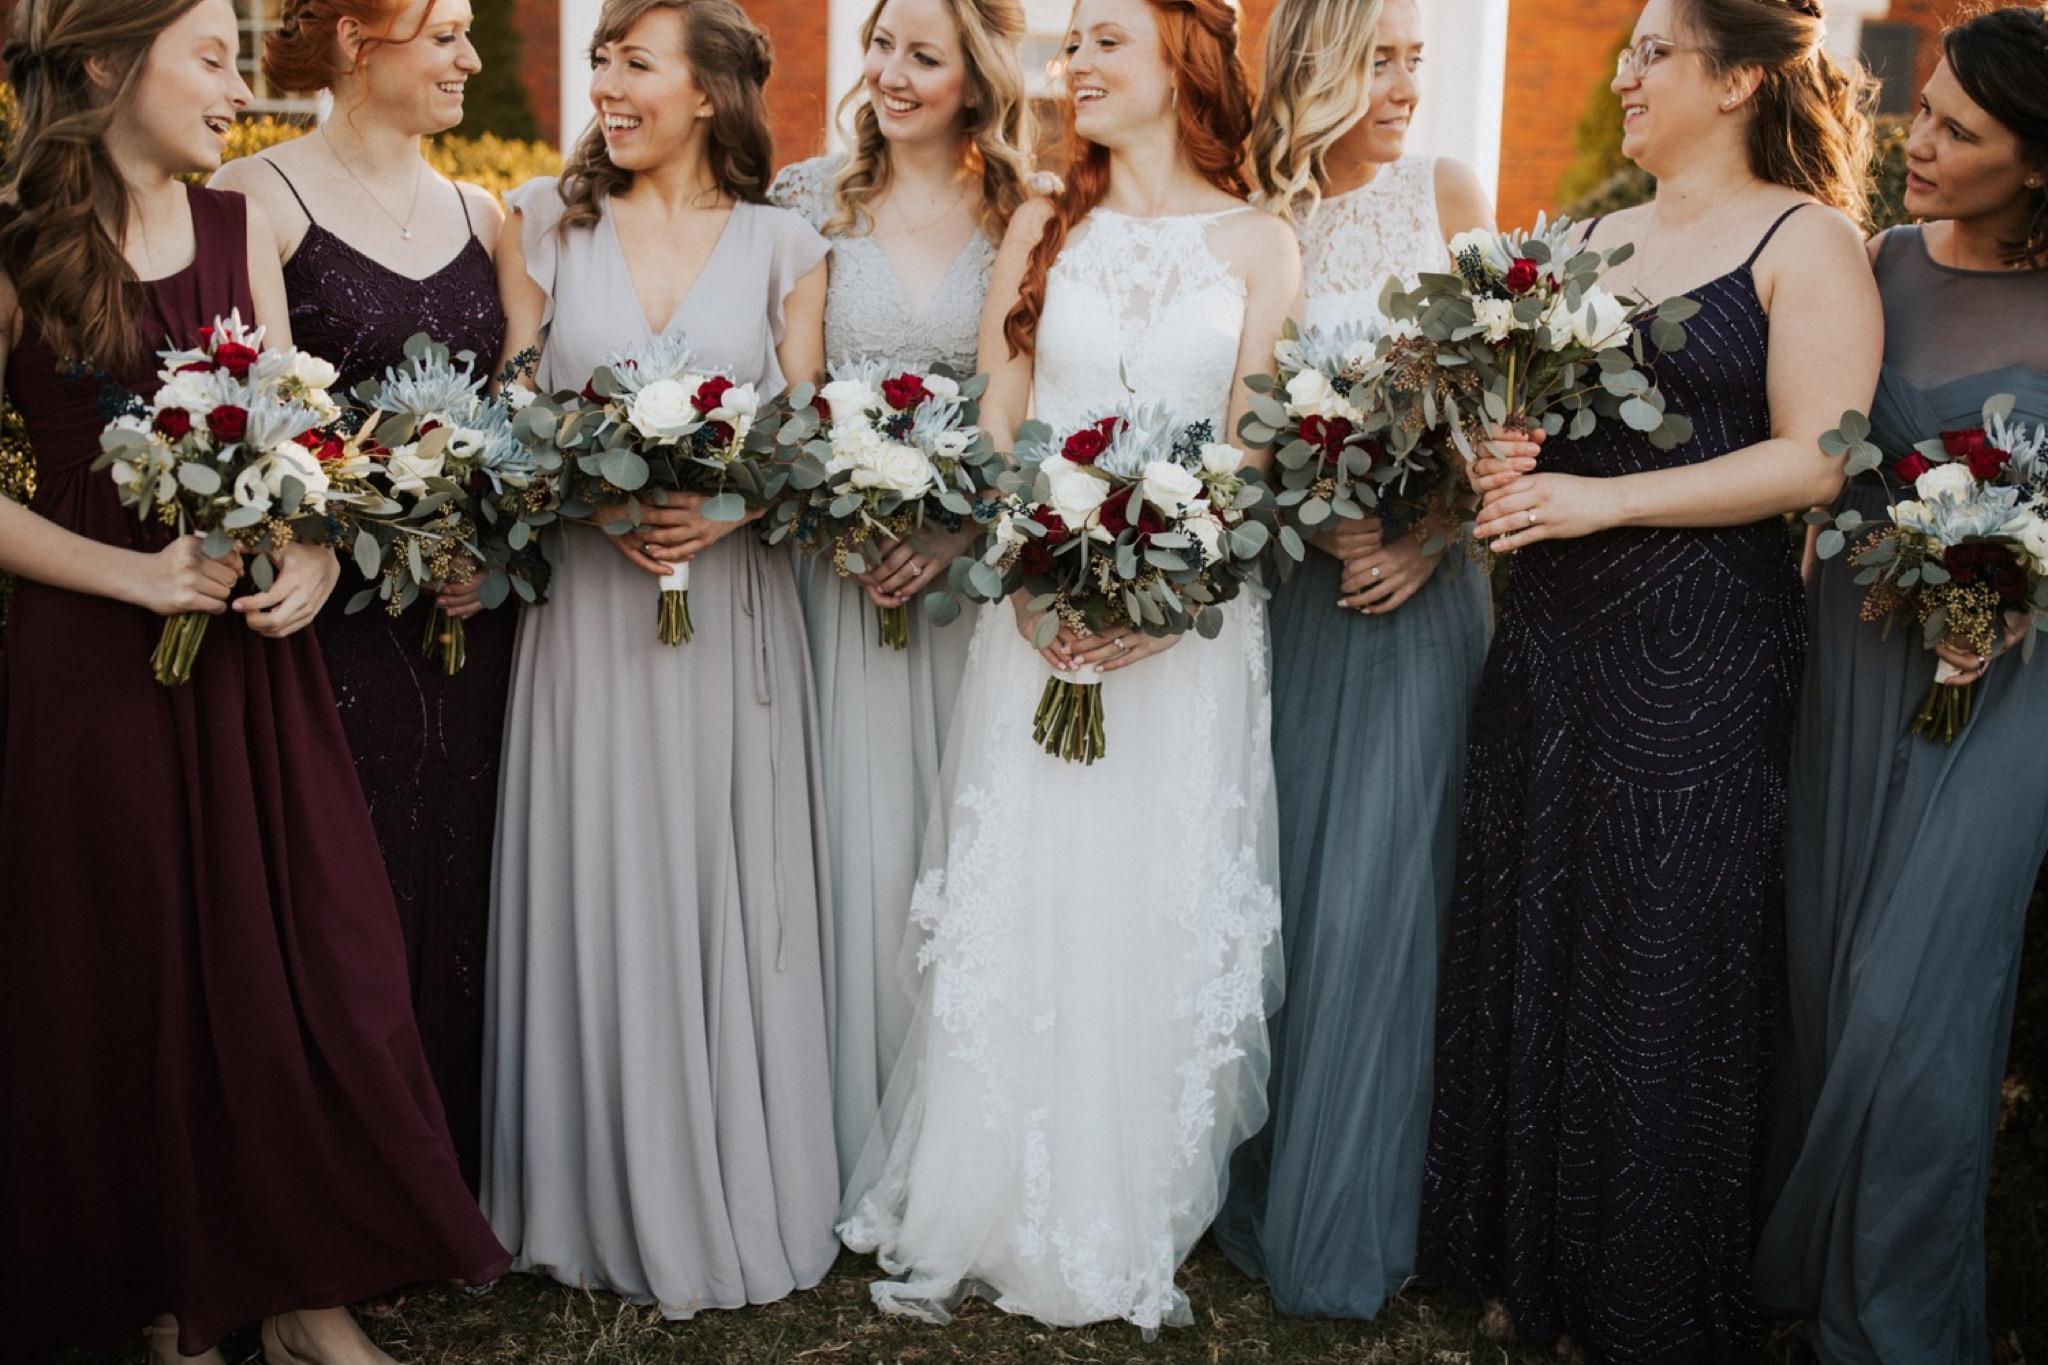 60_West Manor Estate Weddings - Pat Cori Photography-125_VirginiaWeddingPhotographer_bridesmaids_WestManorEstate_Portraits_Wedding.jpg